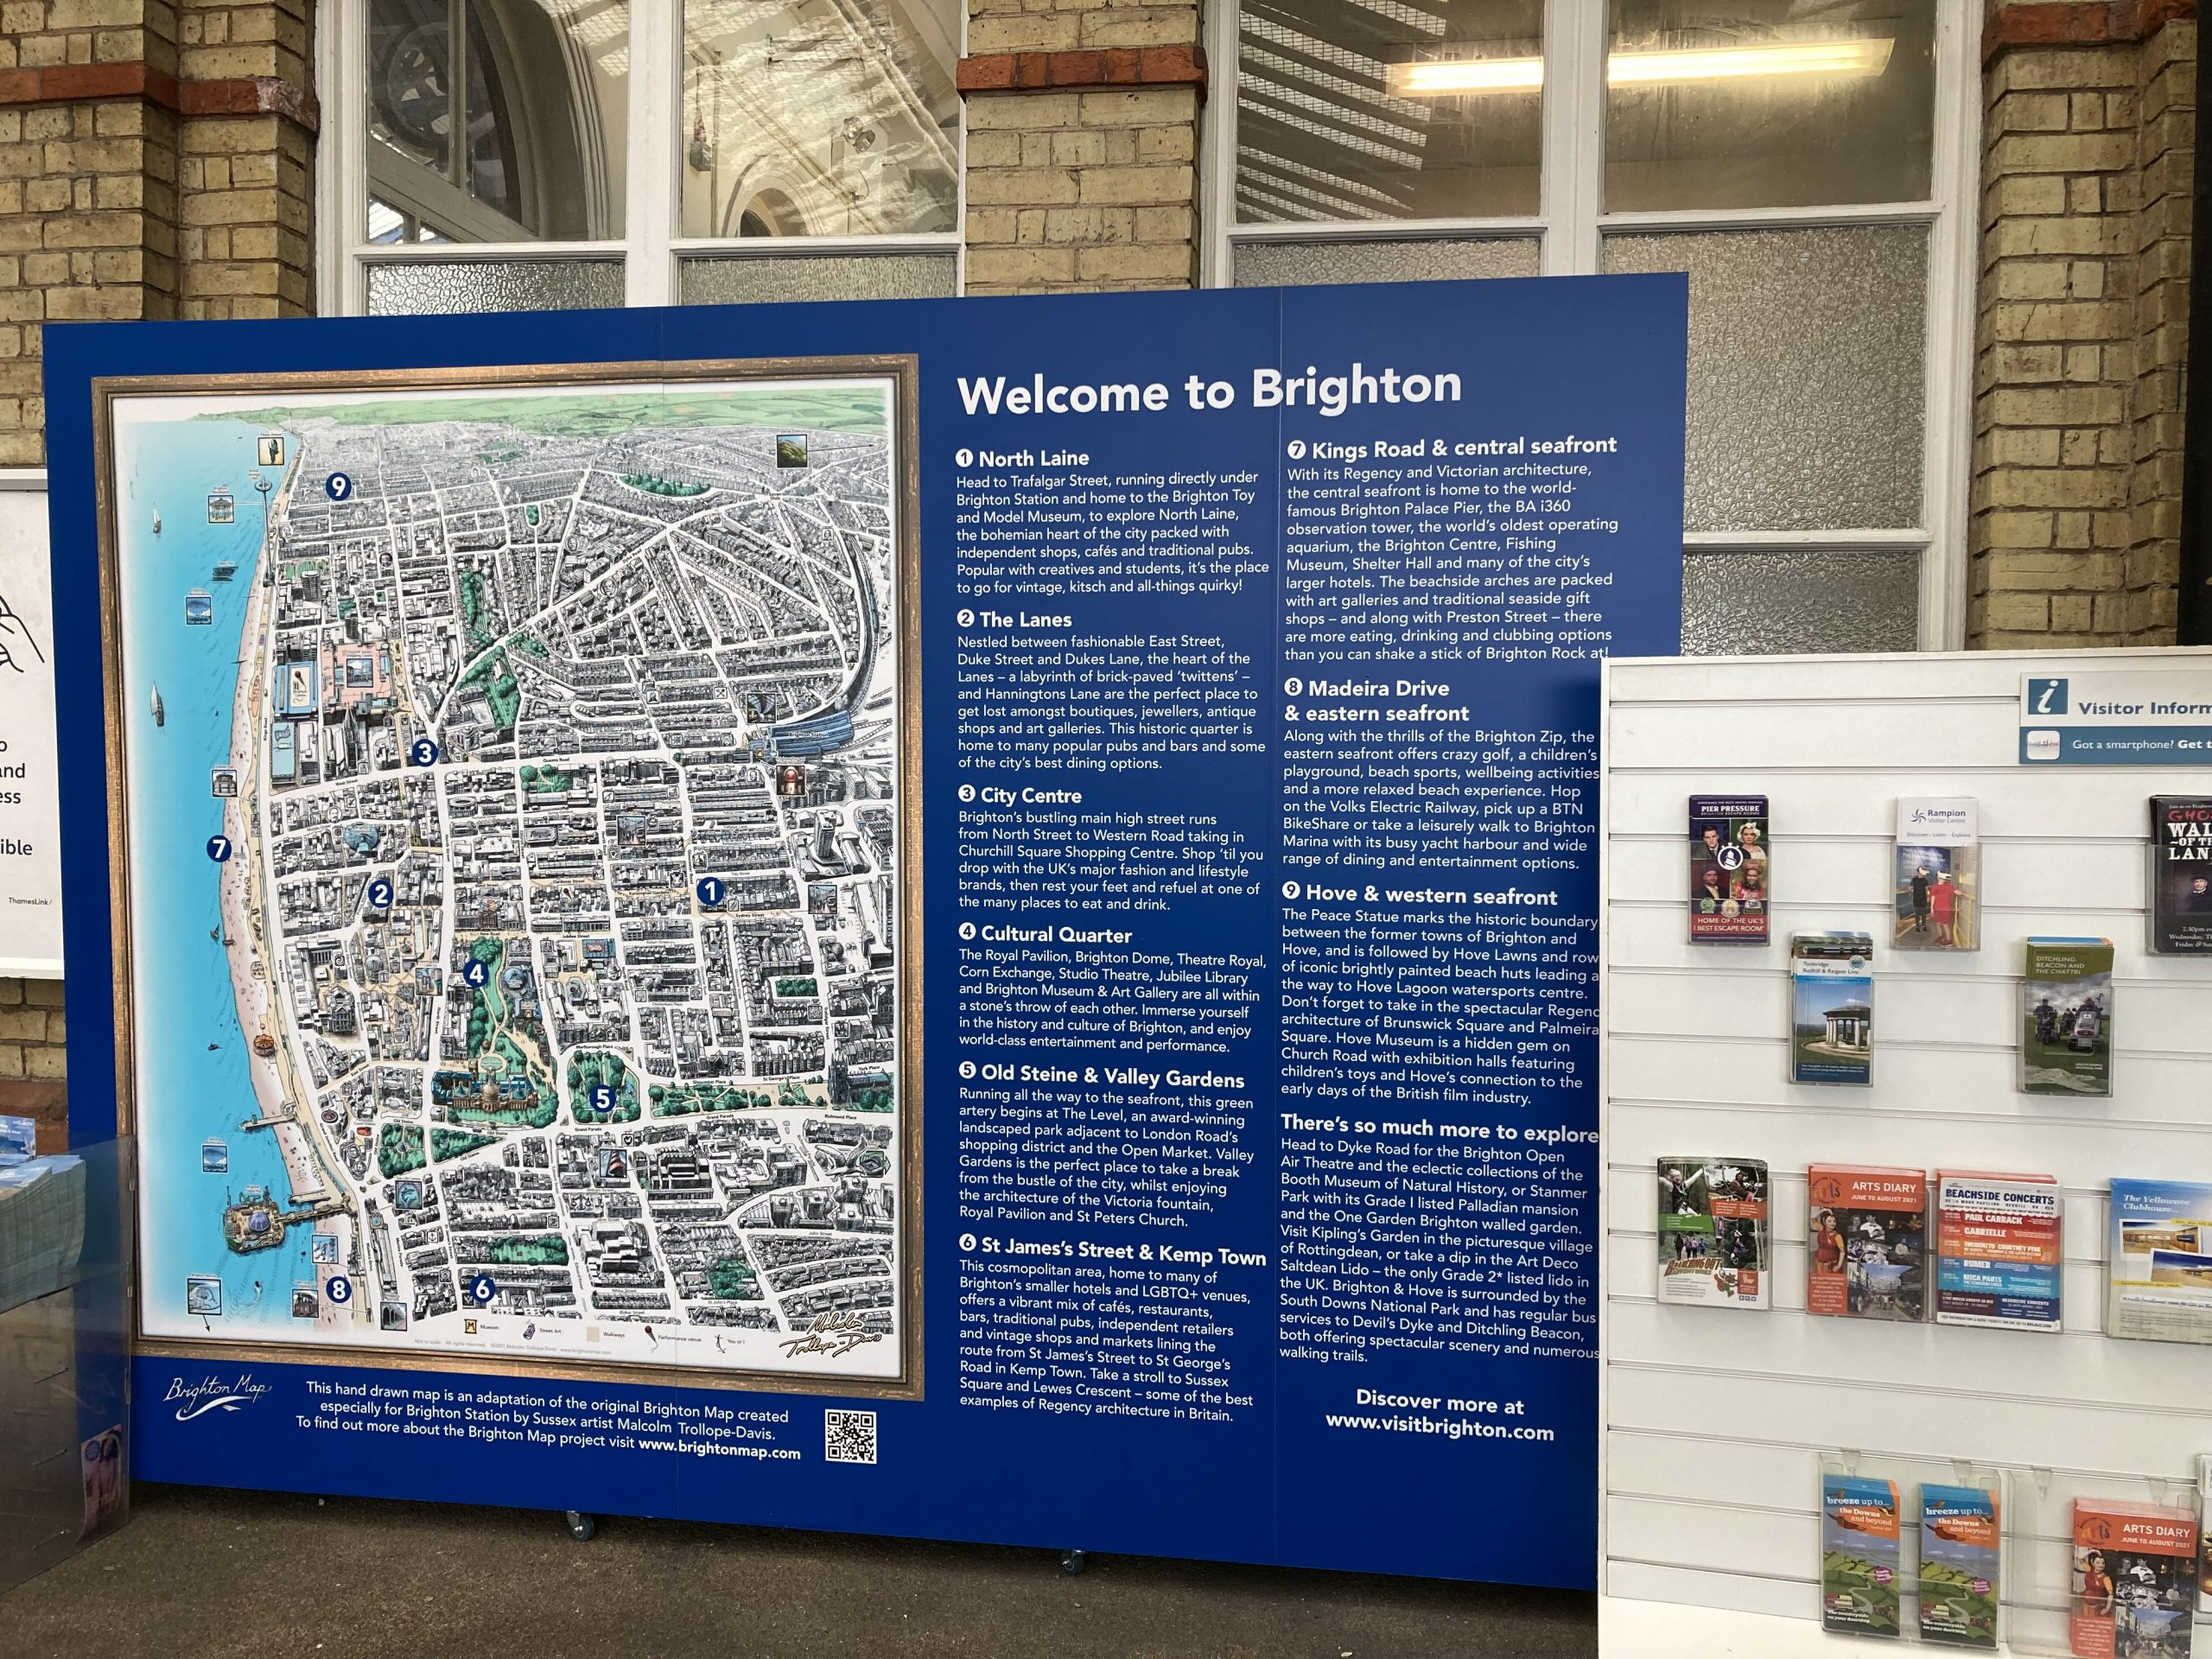 New visitor information at Brighton